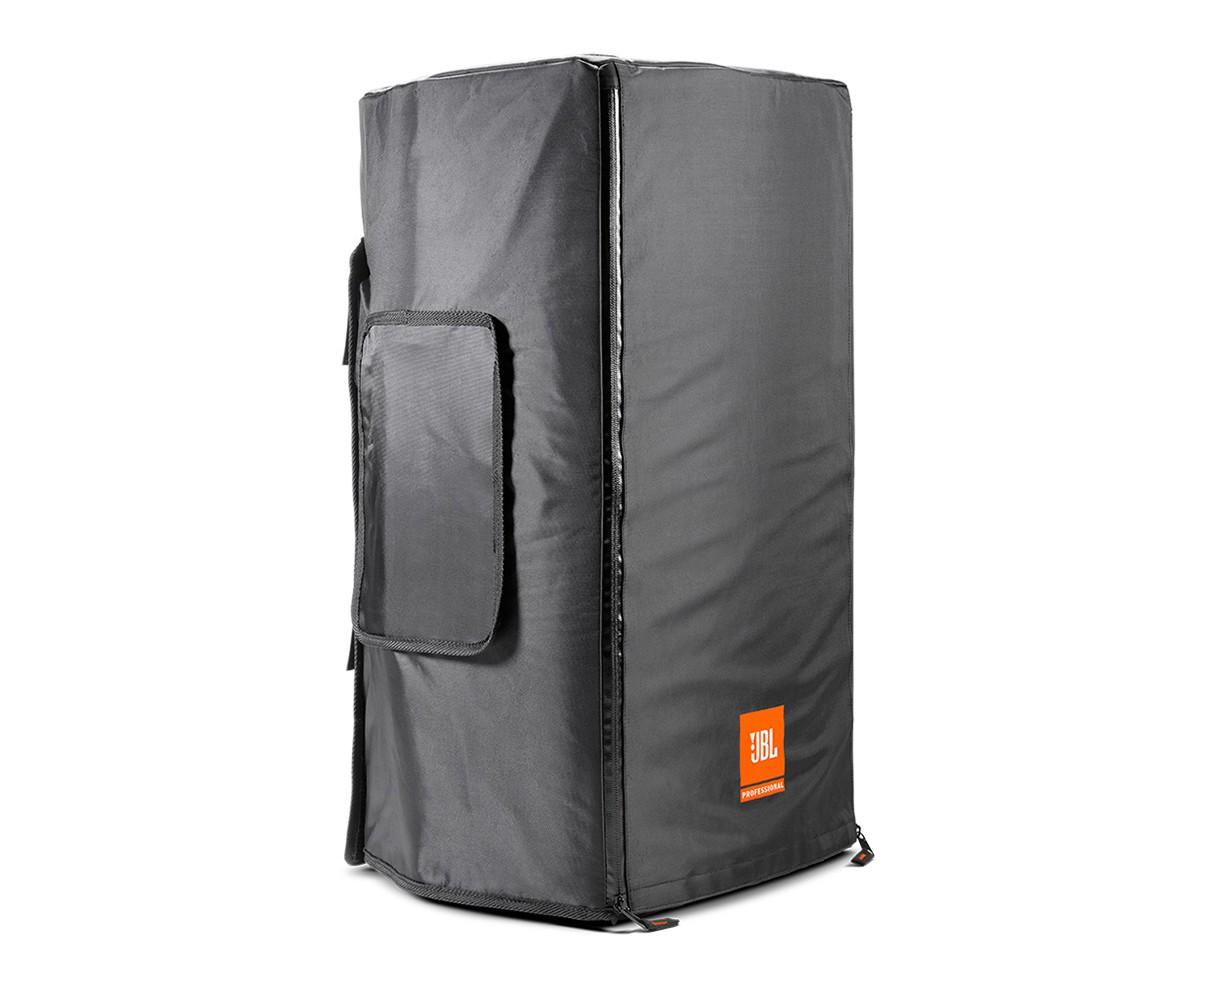 JBL Bags EON615-CVR-WX